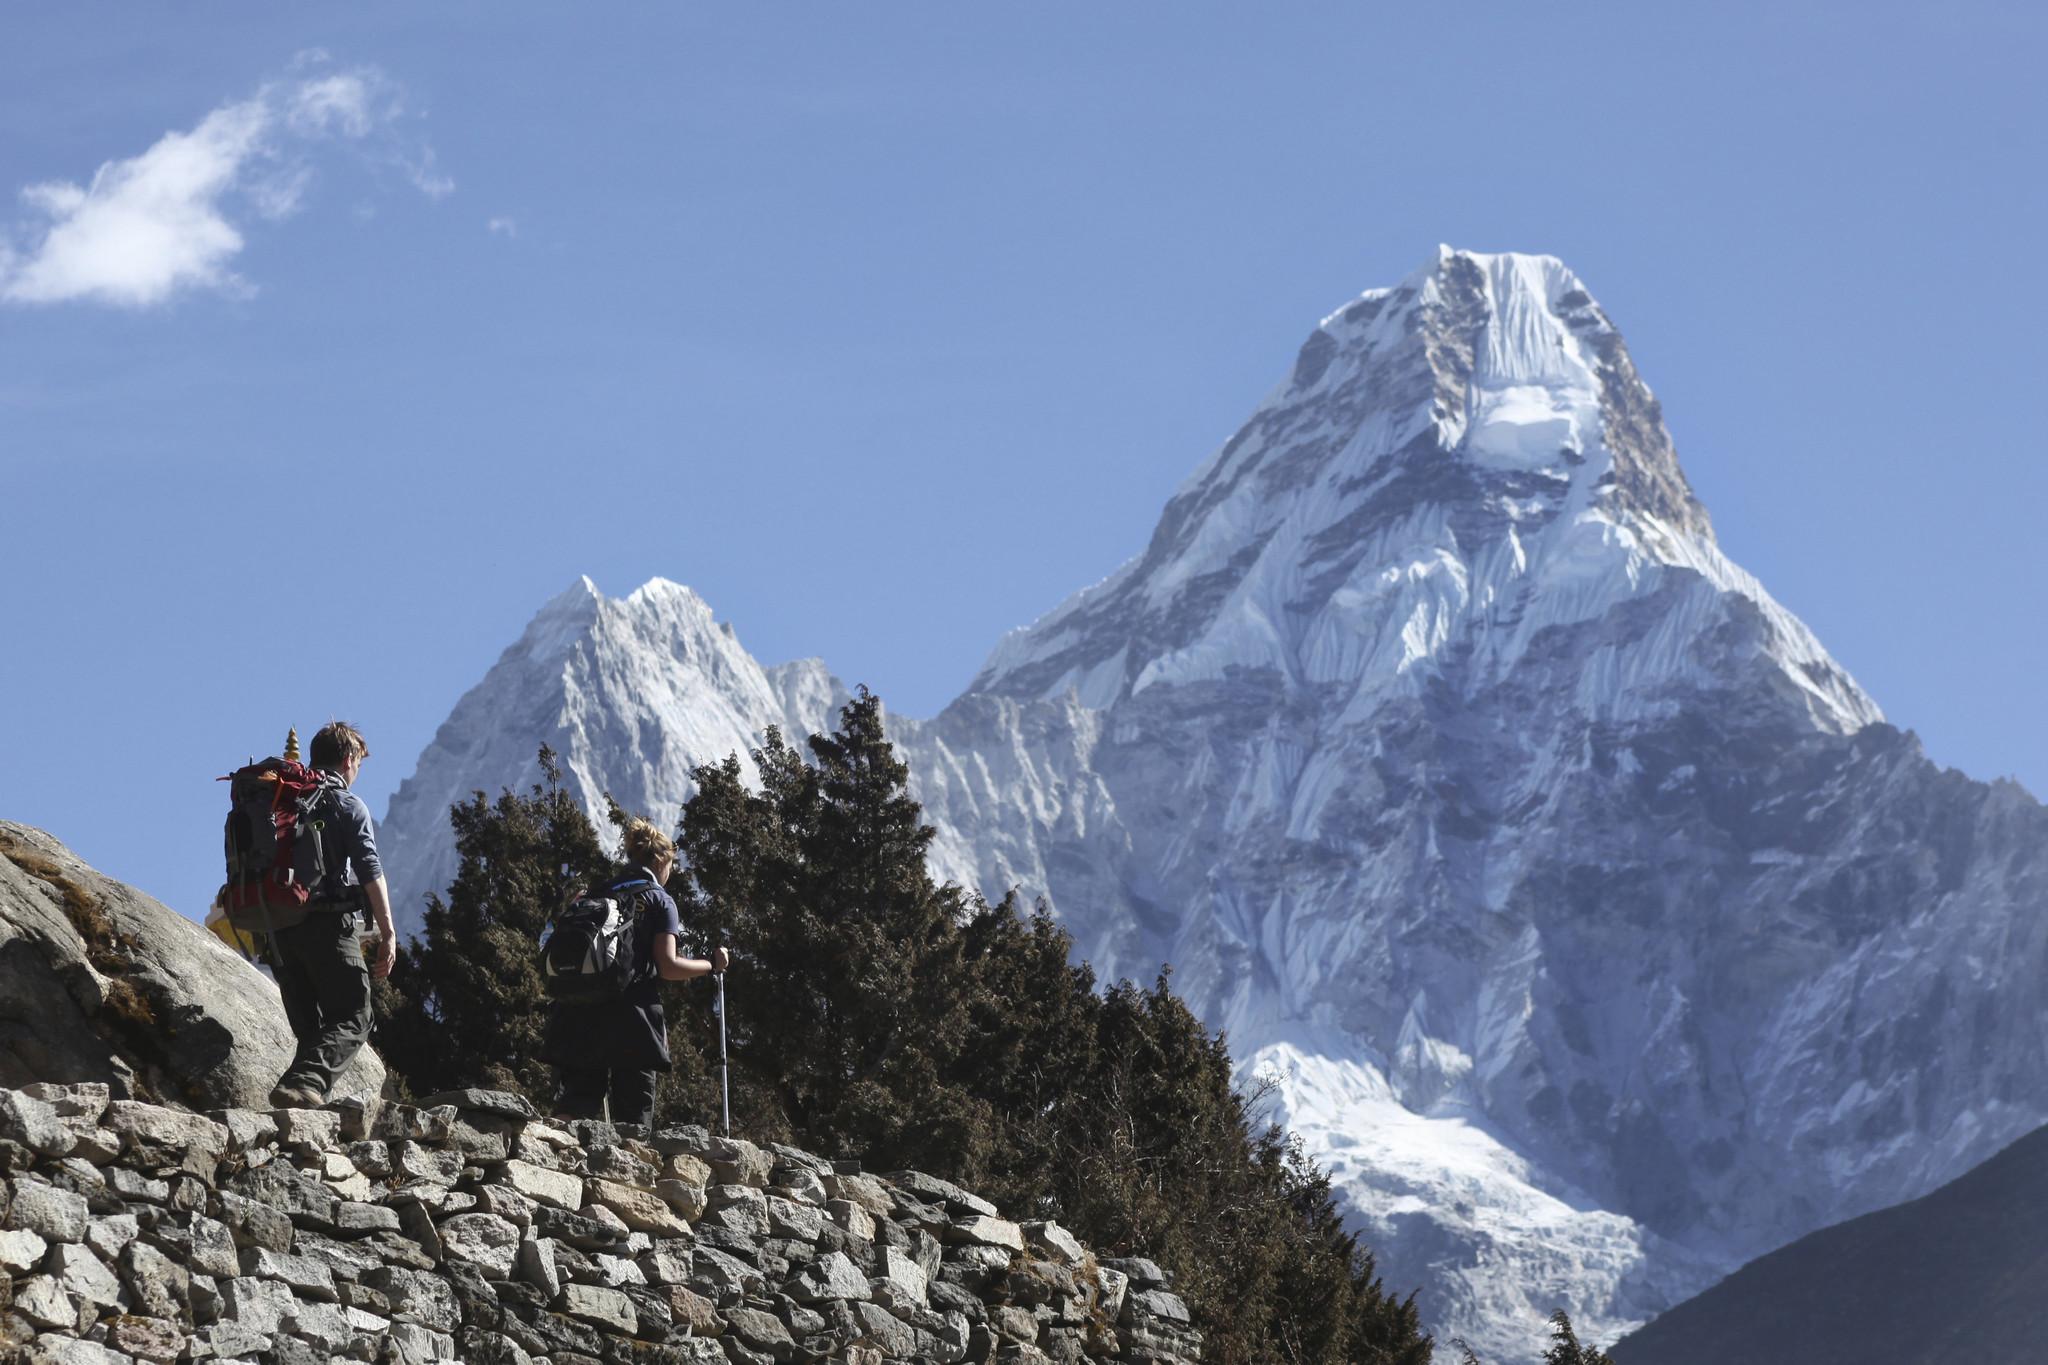 2 climbers dead, 2 missing on Mount Everest - Sun Sentinel